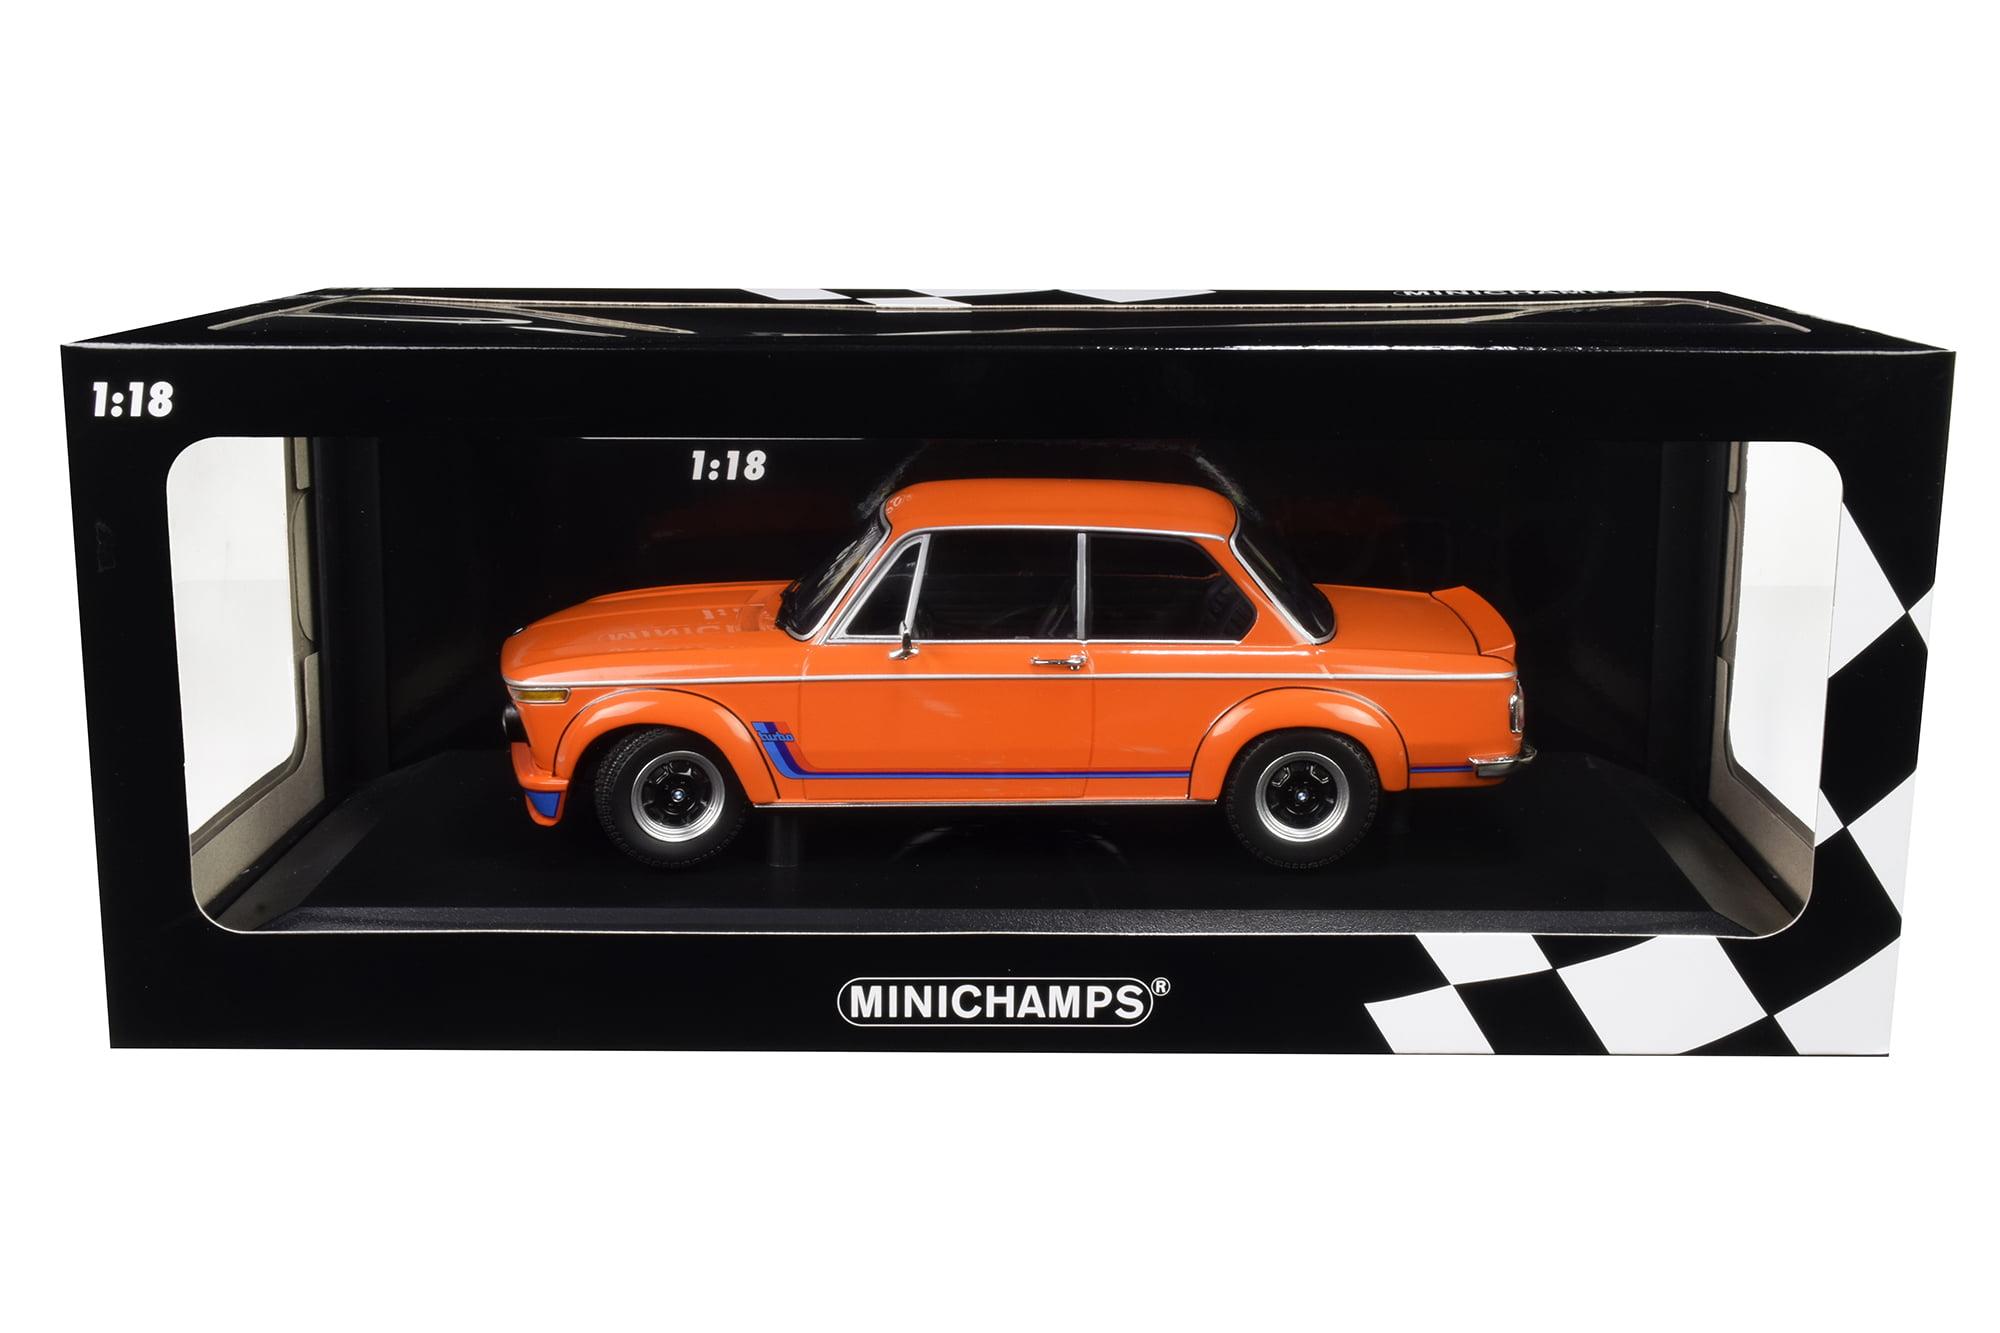 1973 Bmw 2002 Turbo Orange With Stripes Limited Edition To 300 Pieces Worldwide 1 18 Diecast Model Car By Minichamps Walmart Com Walmart Com